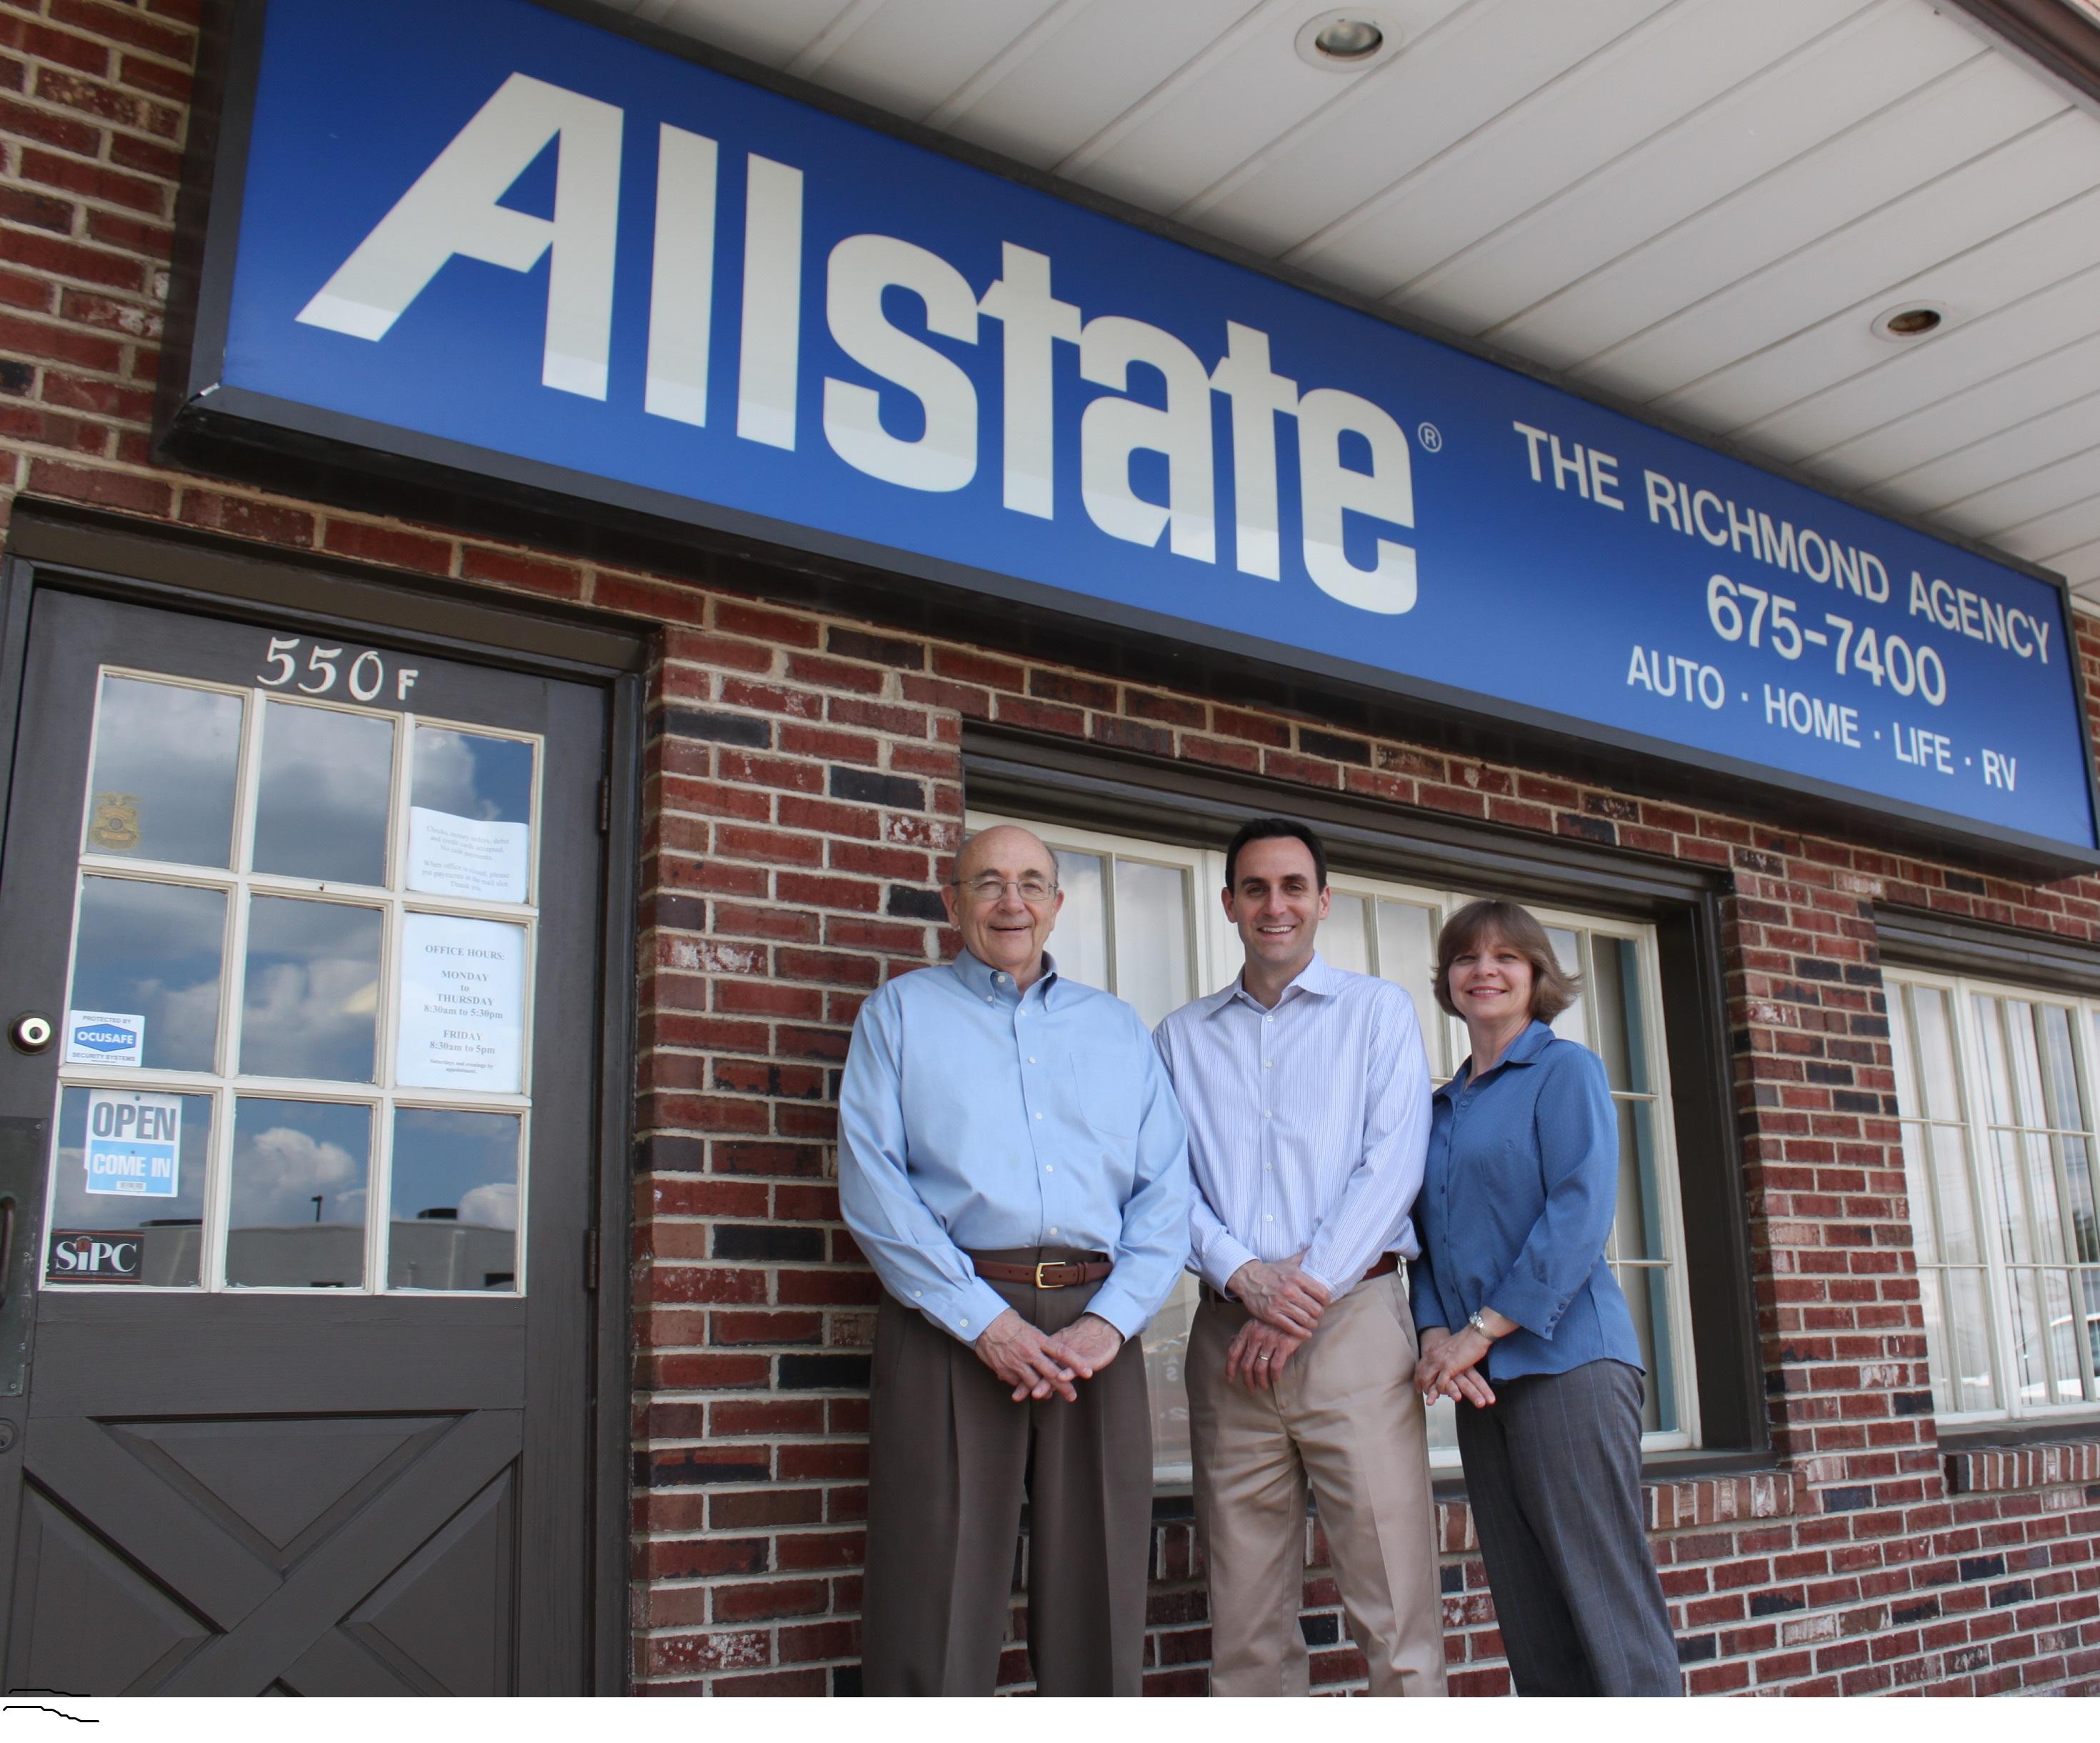 Steven Richmond: Allstate Insurance image 4